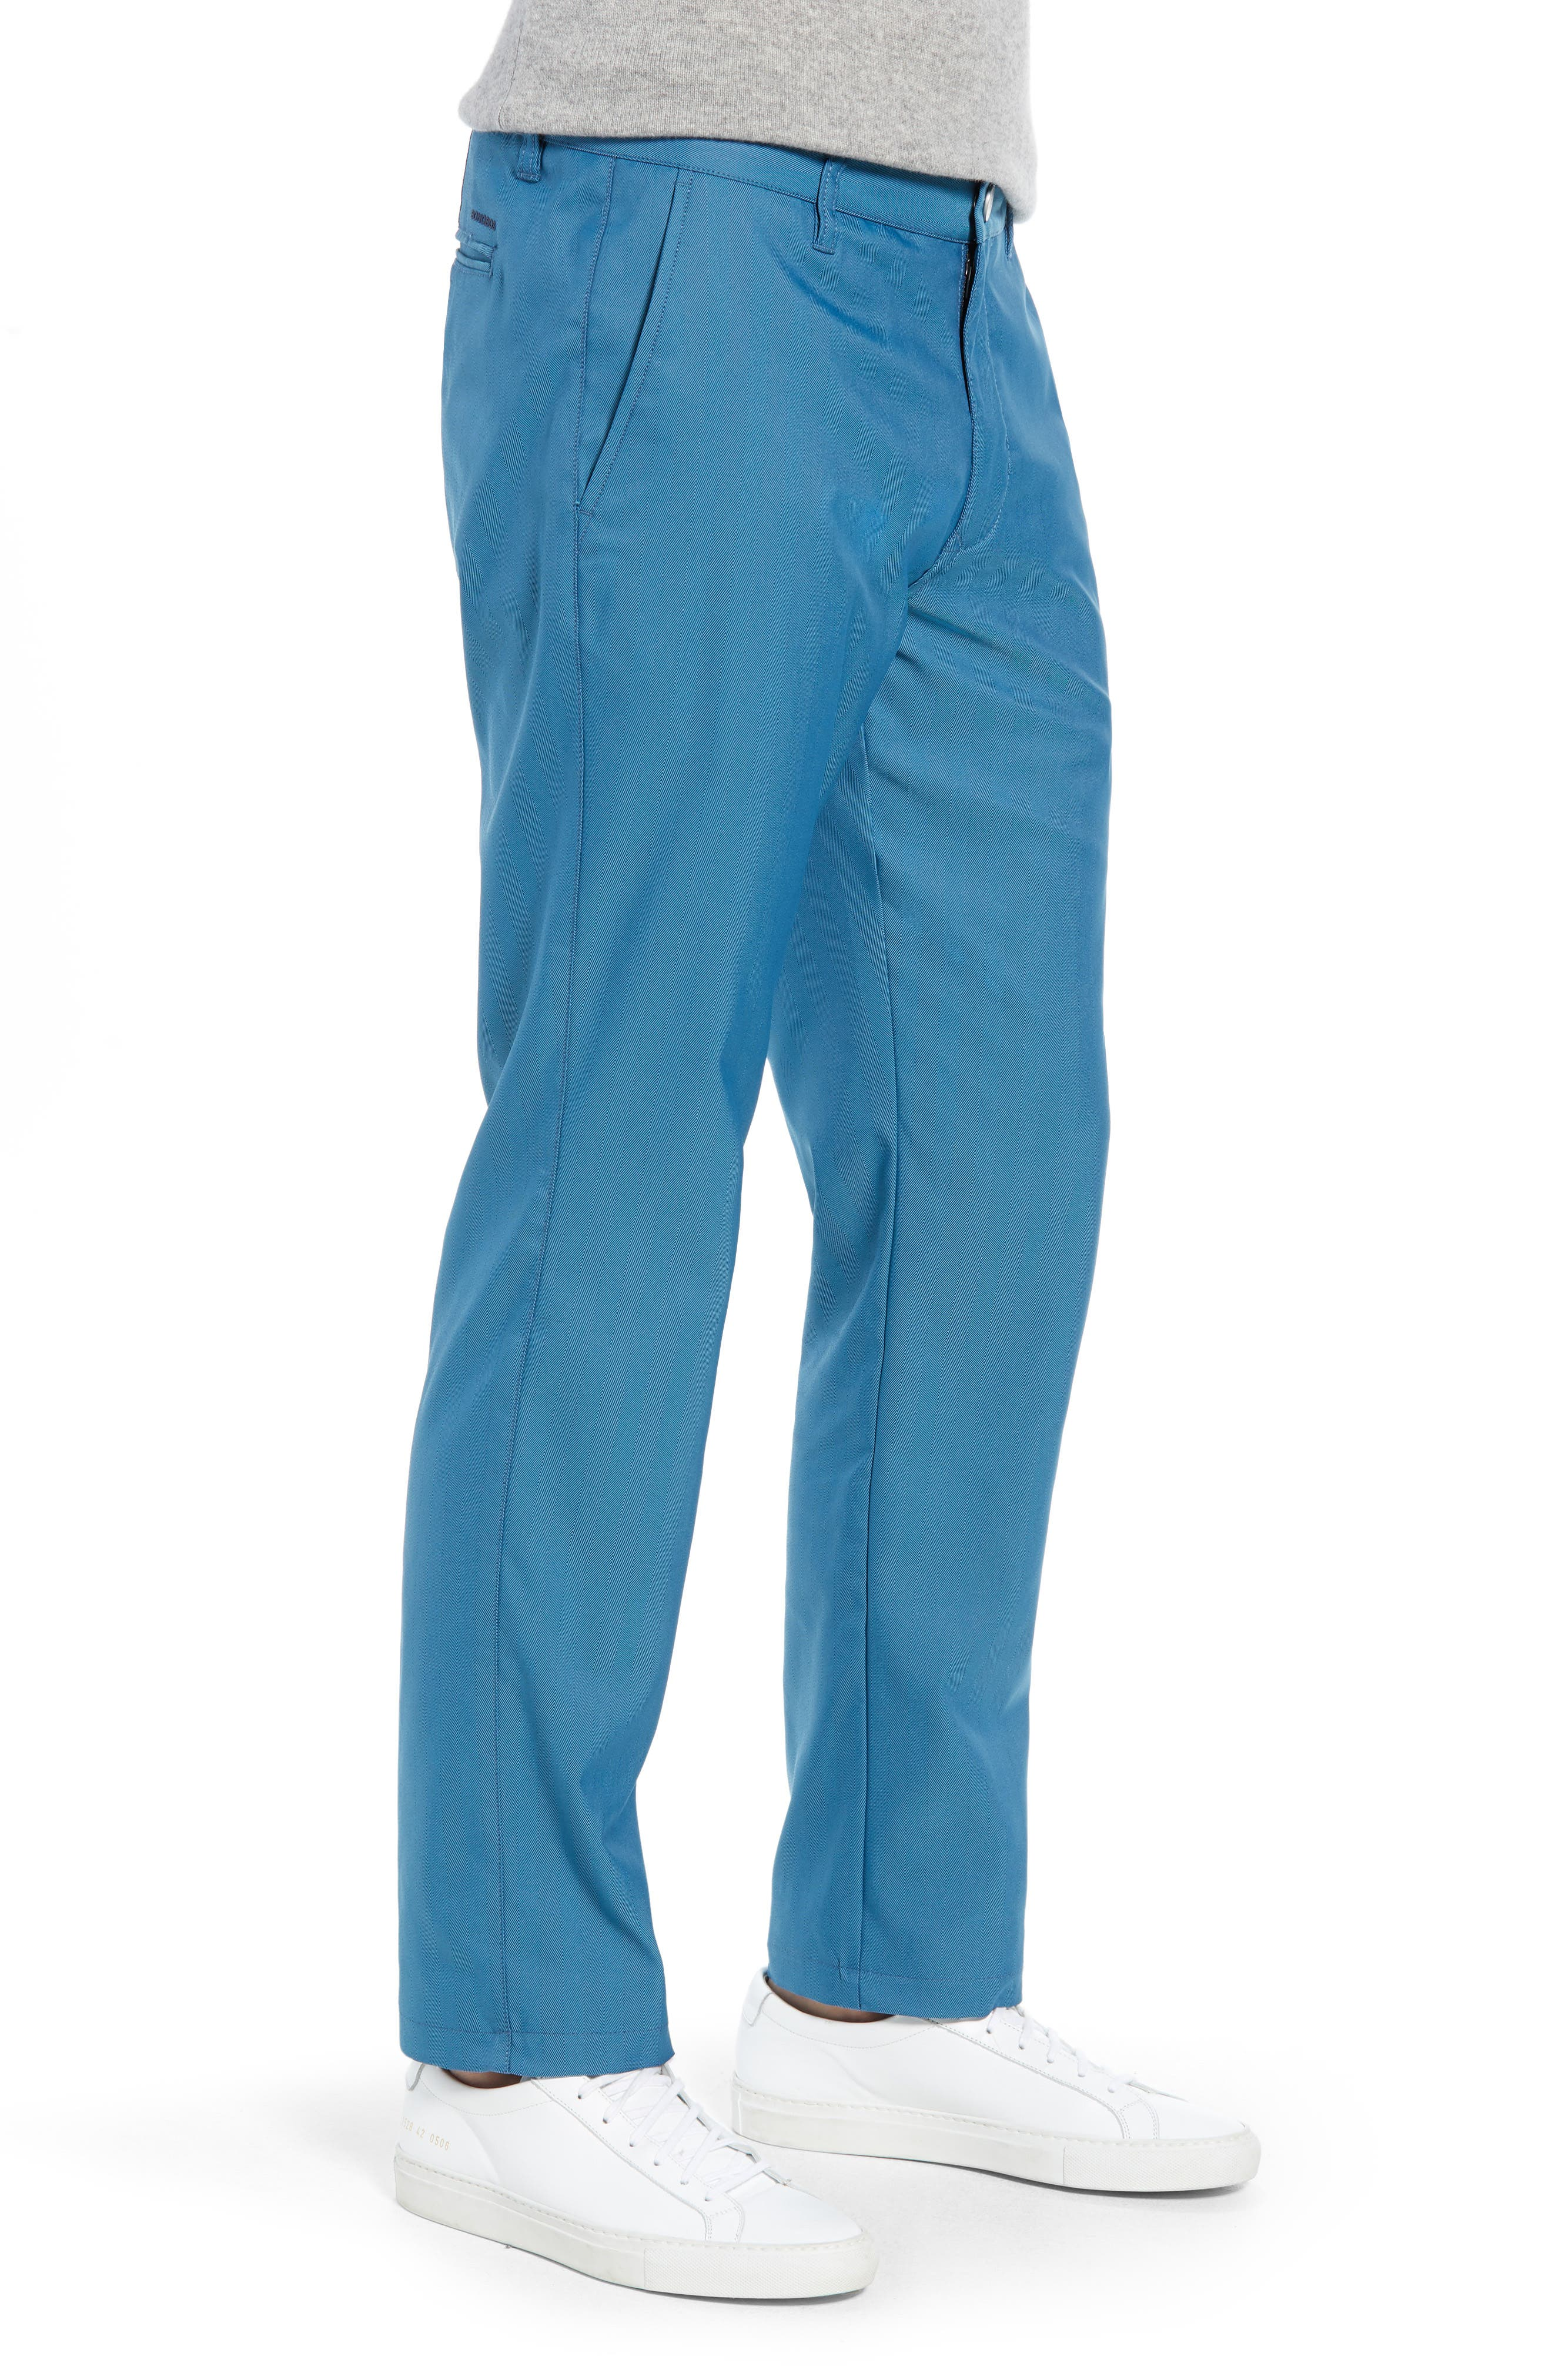 Highland Slim Fit Golf Pants,                             Alternate thumbnail 3, color,                             400